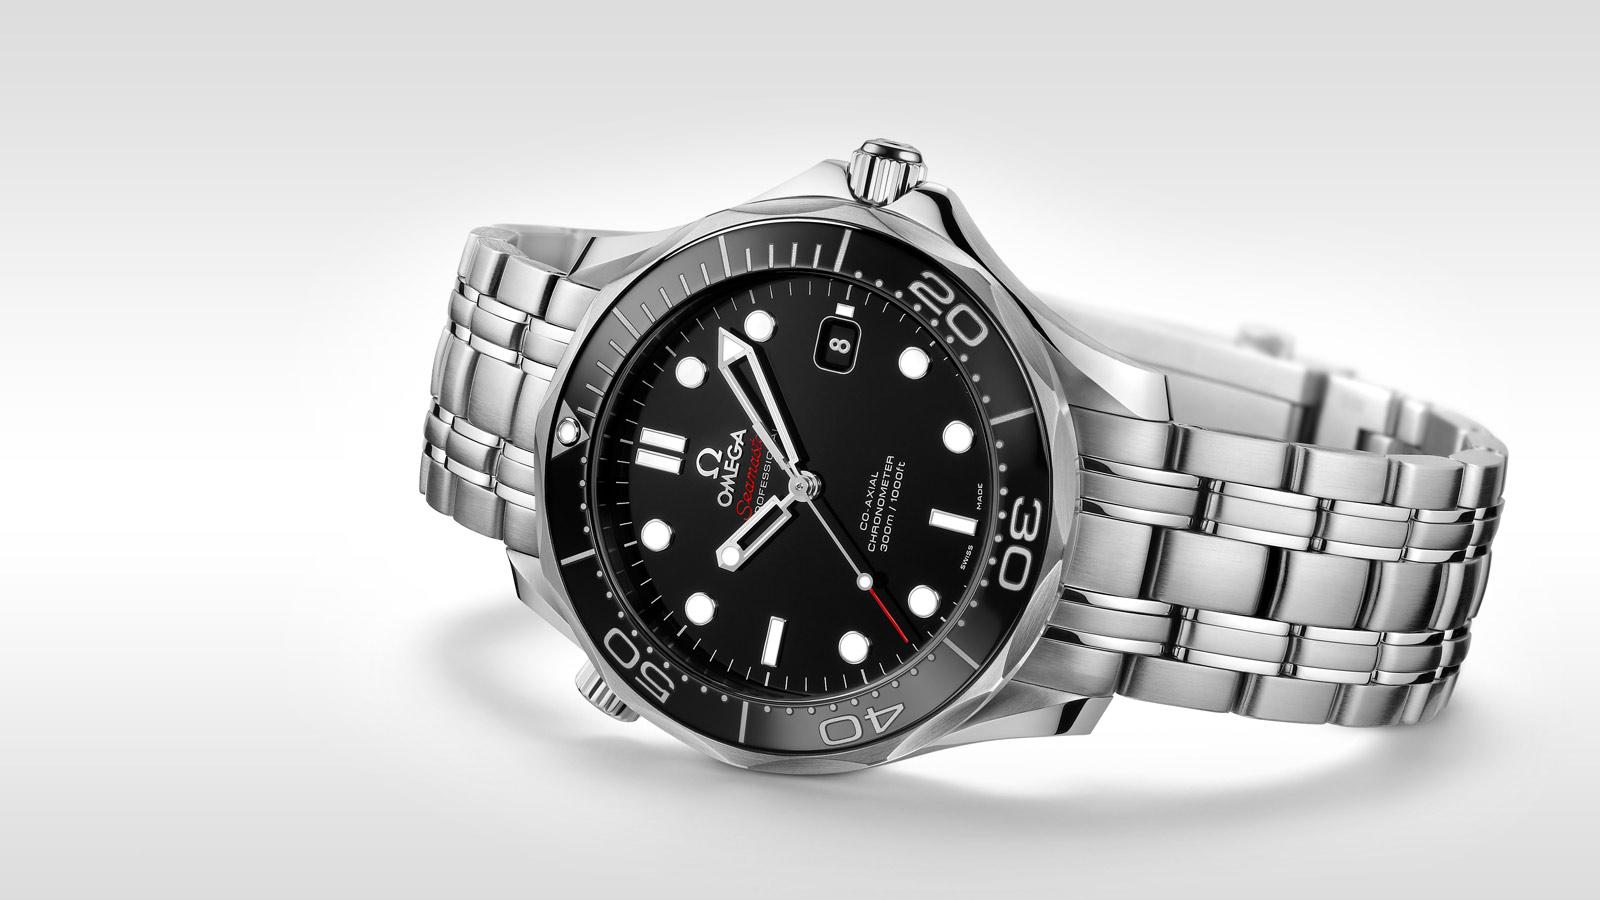 Omega B0072C8SMQ B0072C8SMQ OMEGA Seamaster Men's Steel Bracelet & Case Automatic Black Dial Analog Watch